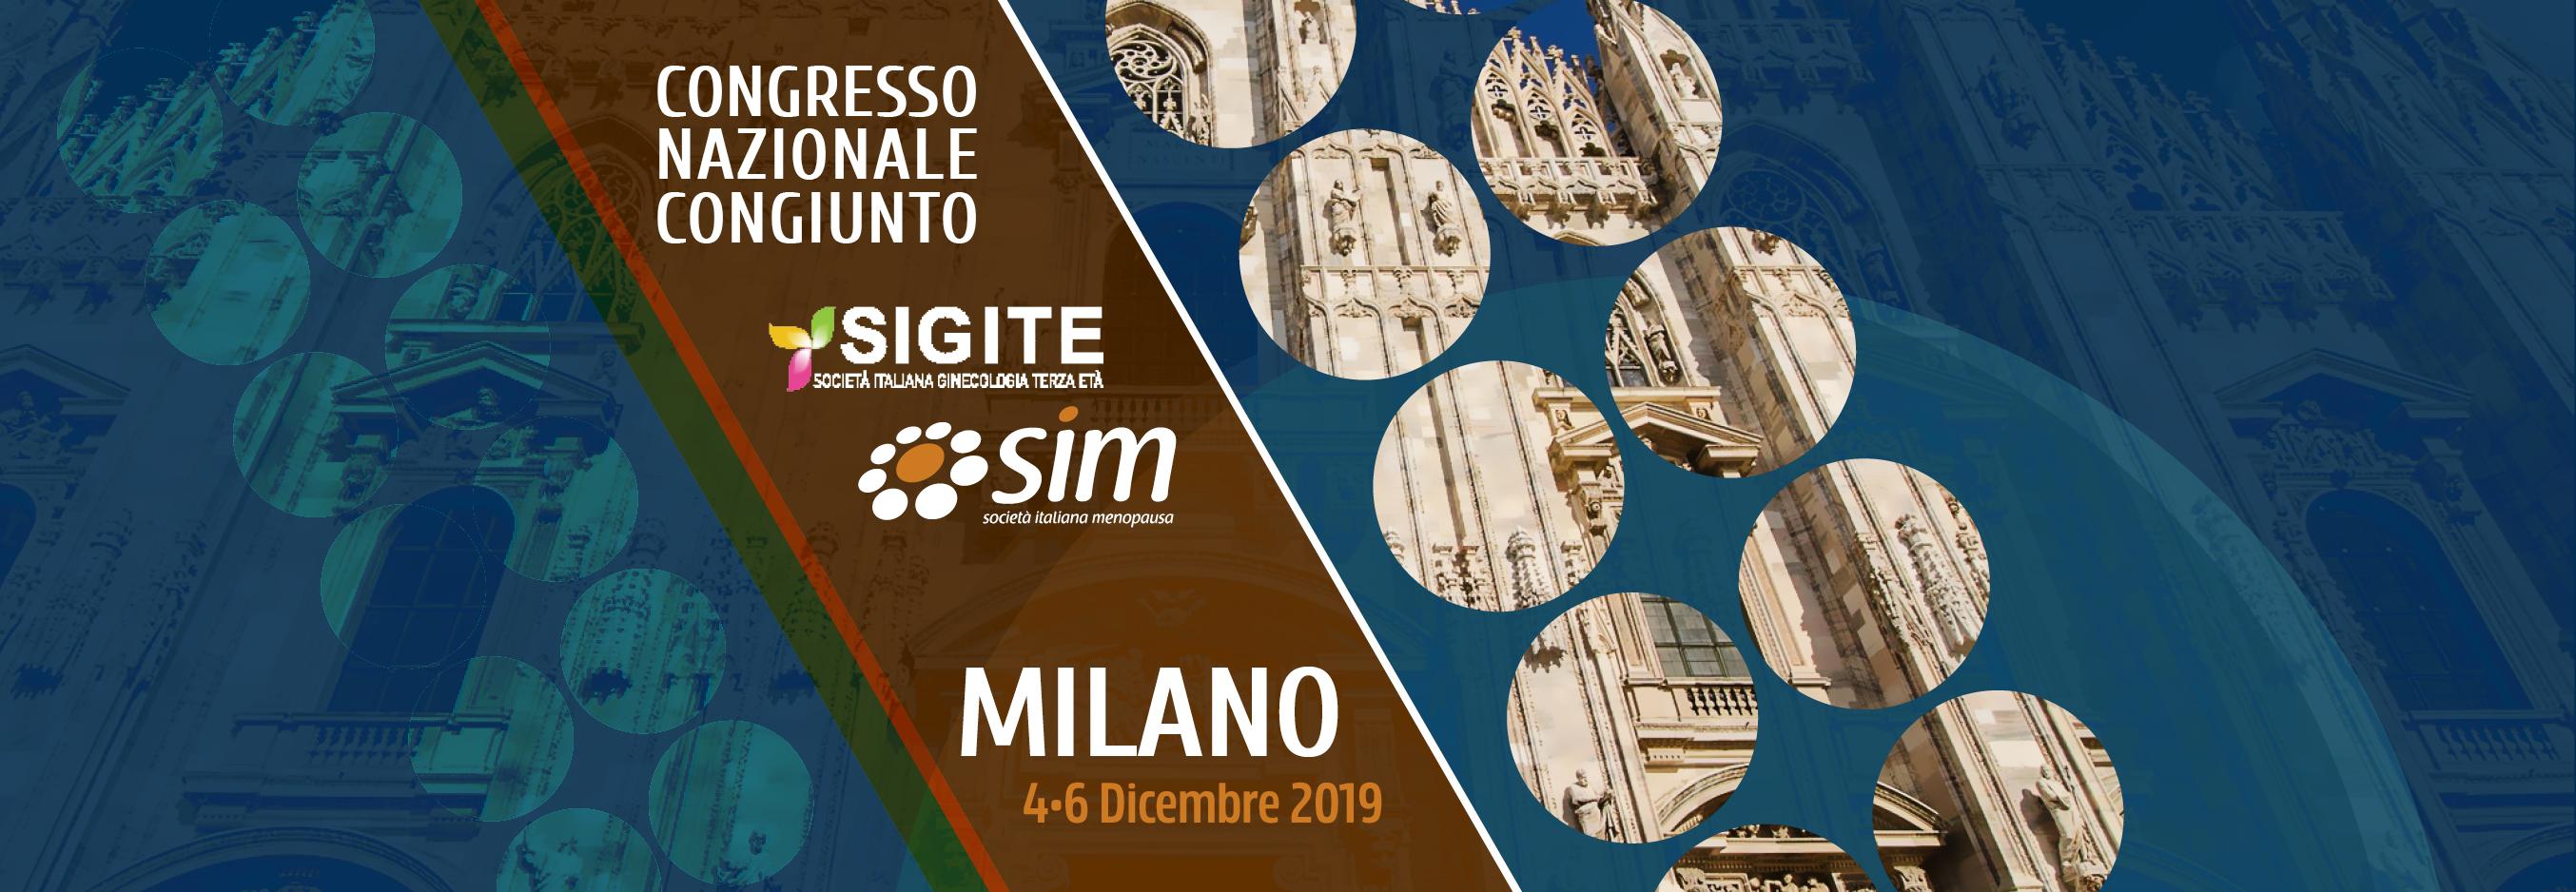 Slide-SIGITE-SIM-Milano-grande